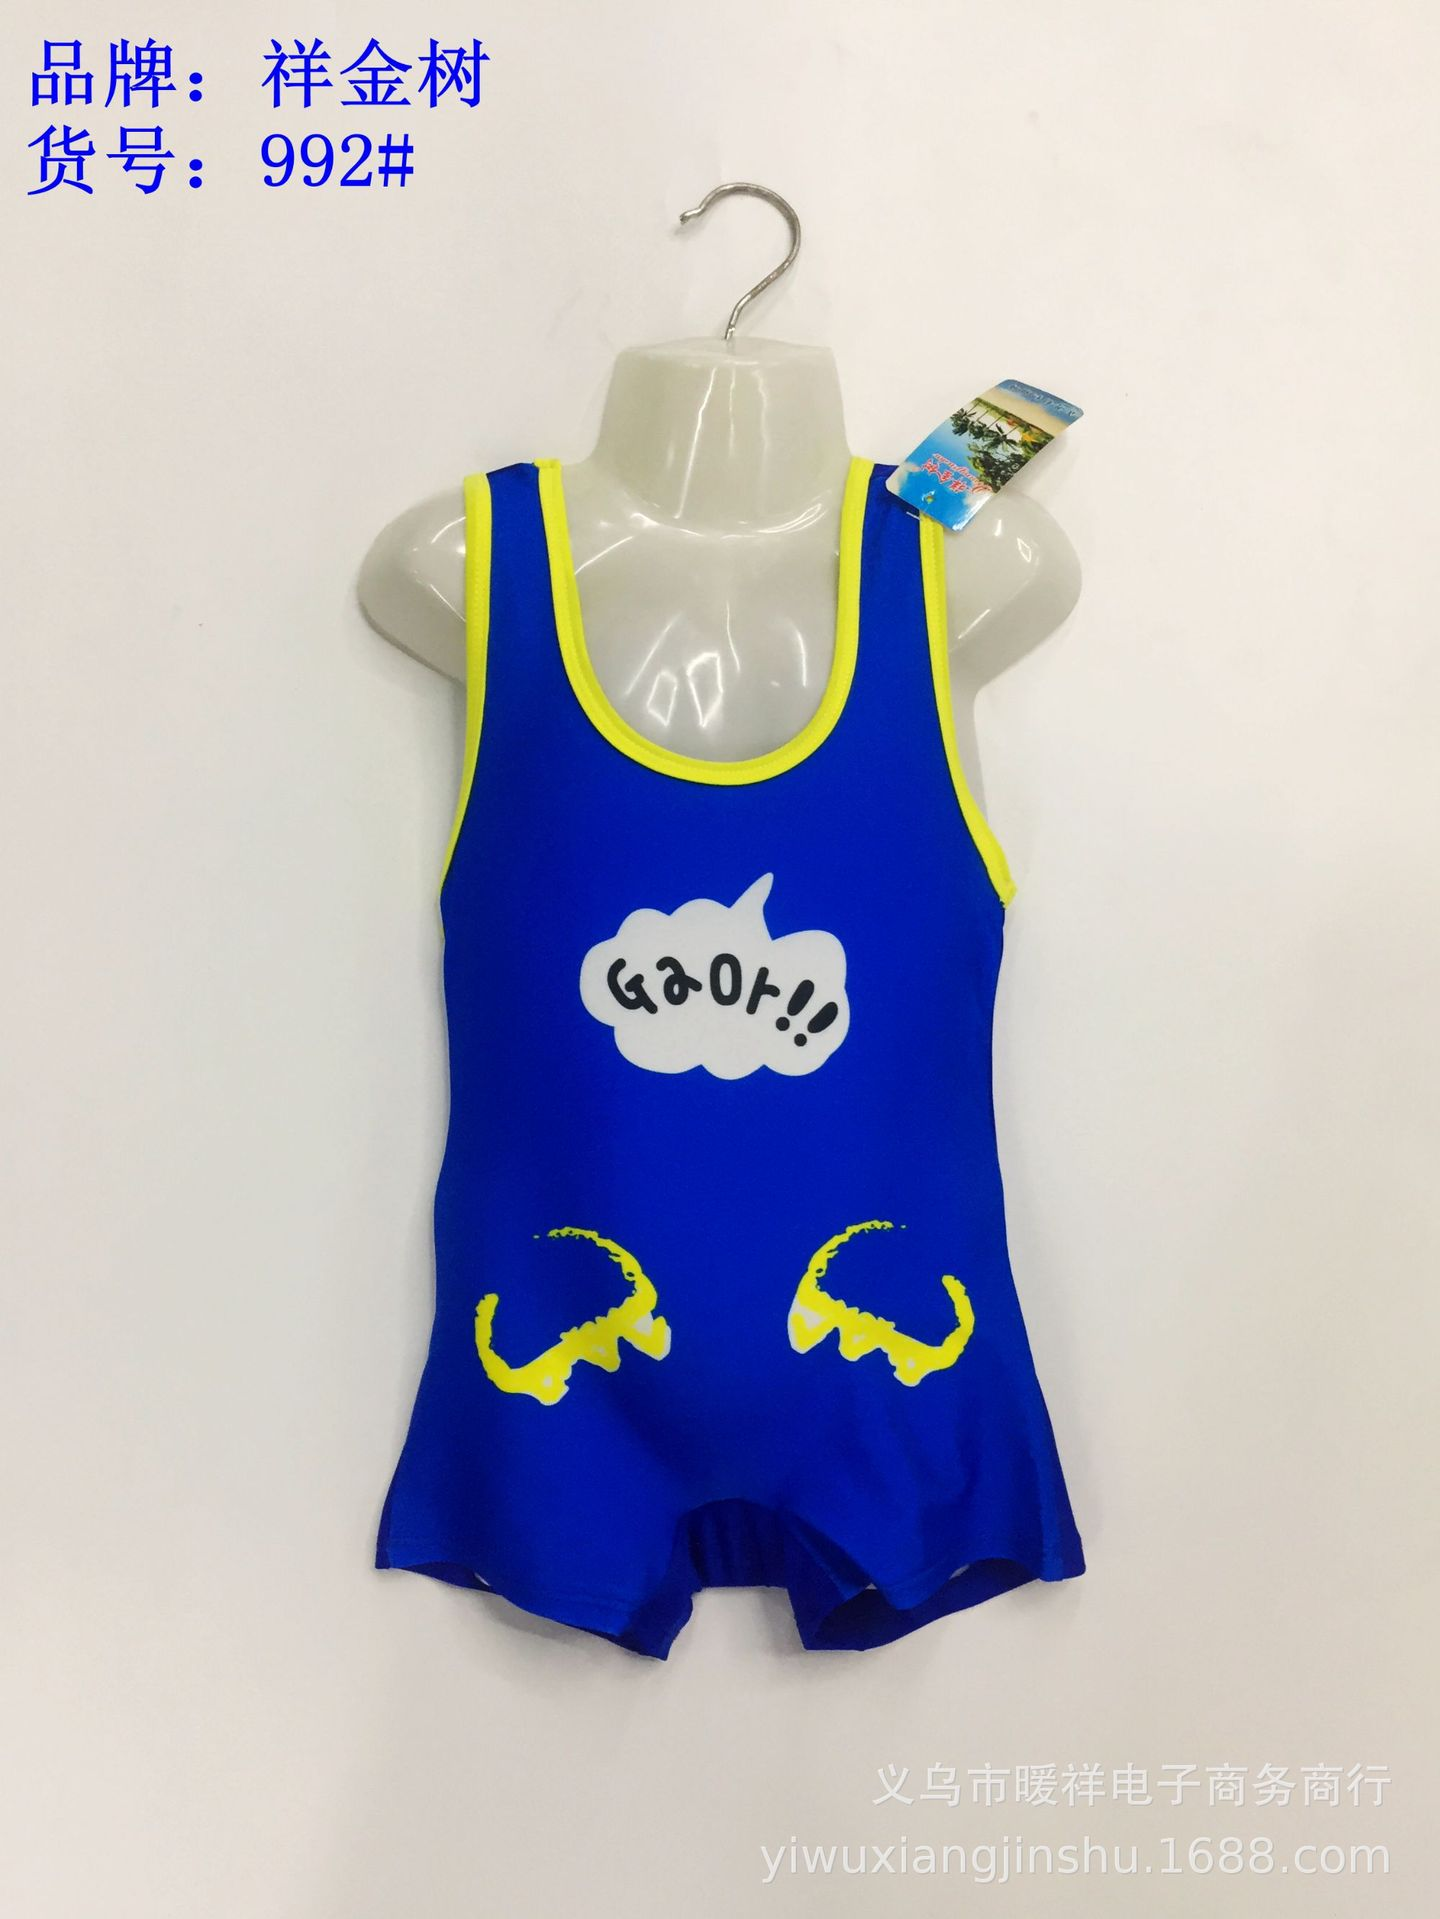 CHILDREN'S Swimwear Small Child Infants BOY'S One-piece Set New Style Boy Baby Sun-resistant Swimwear